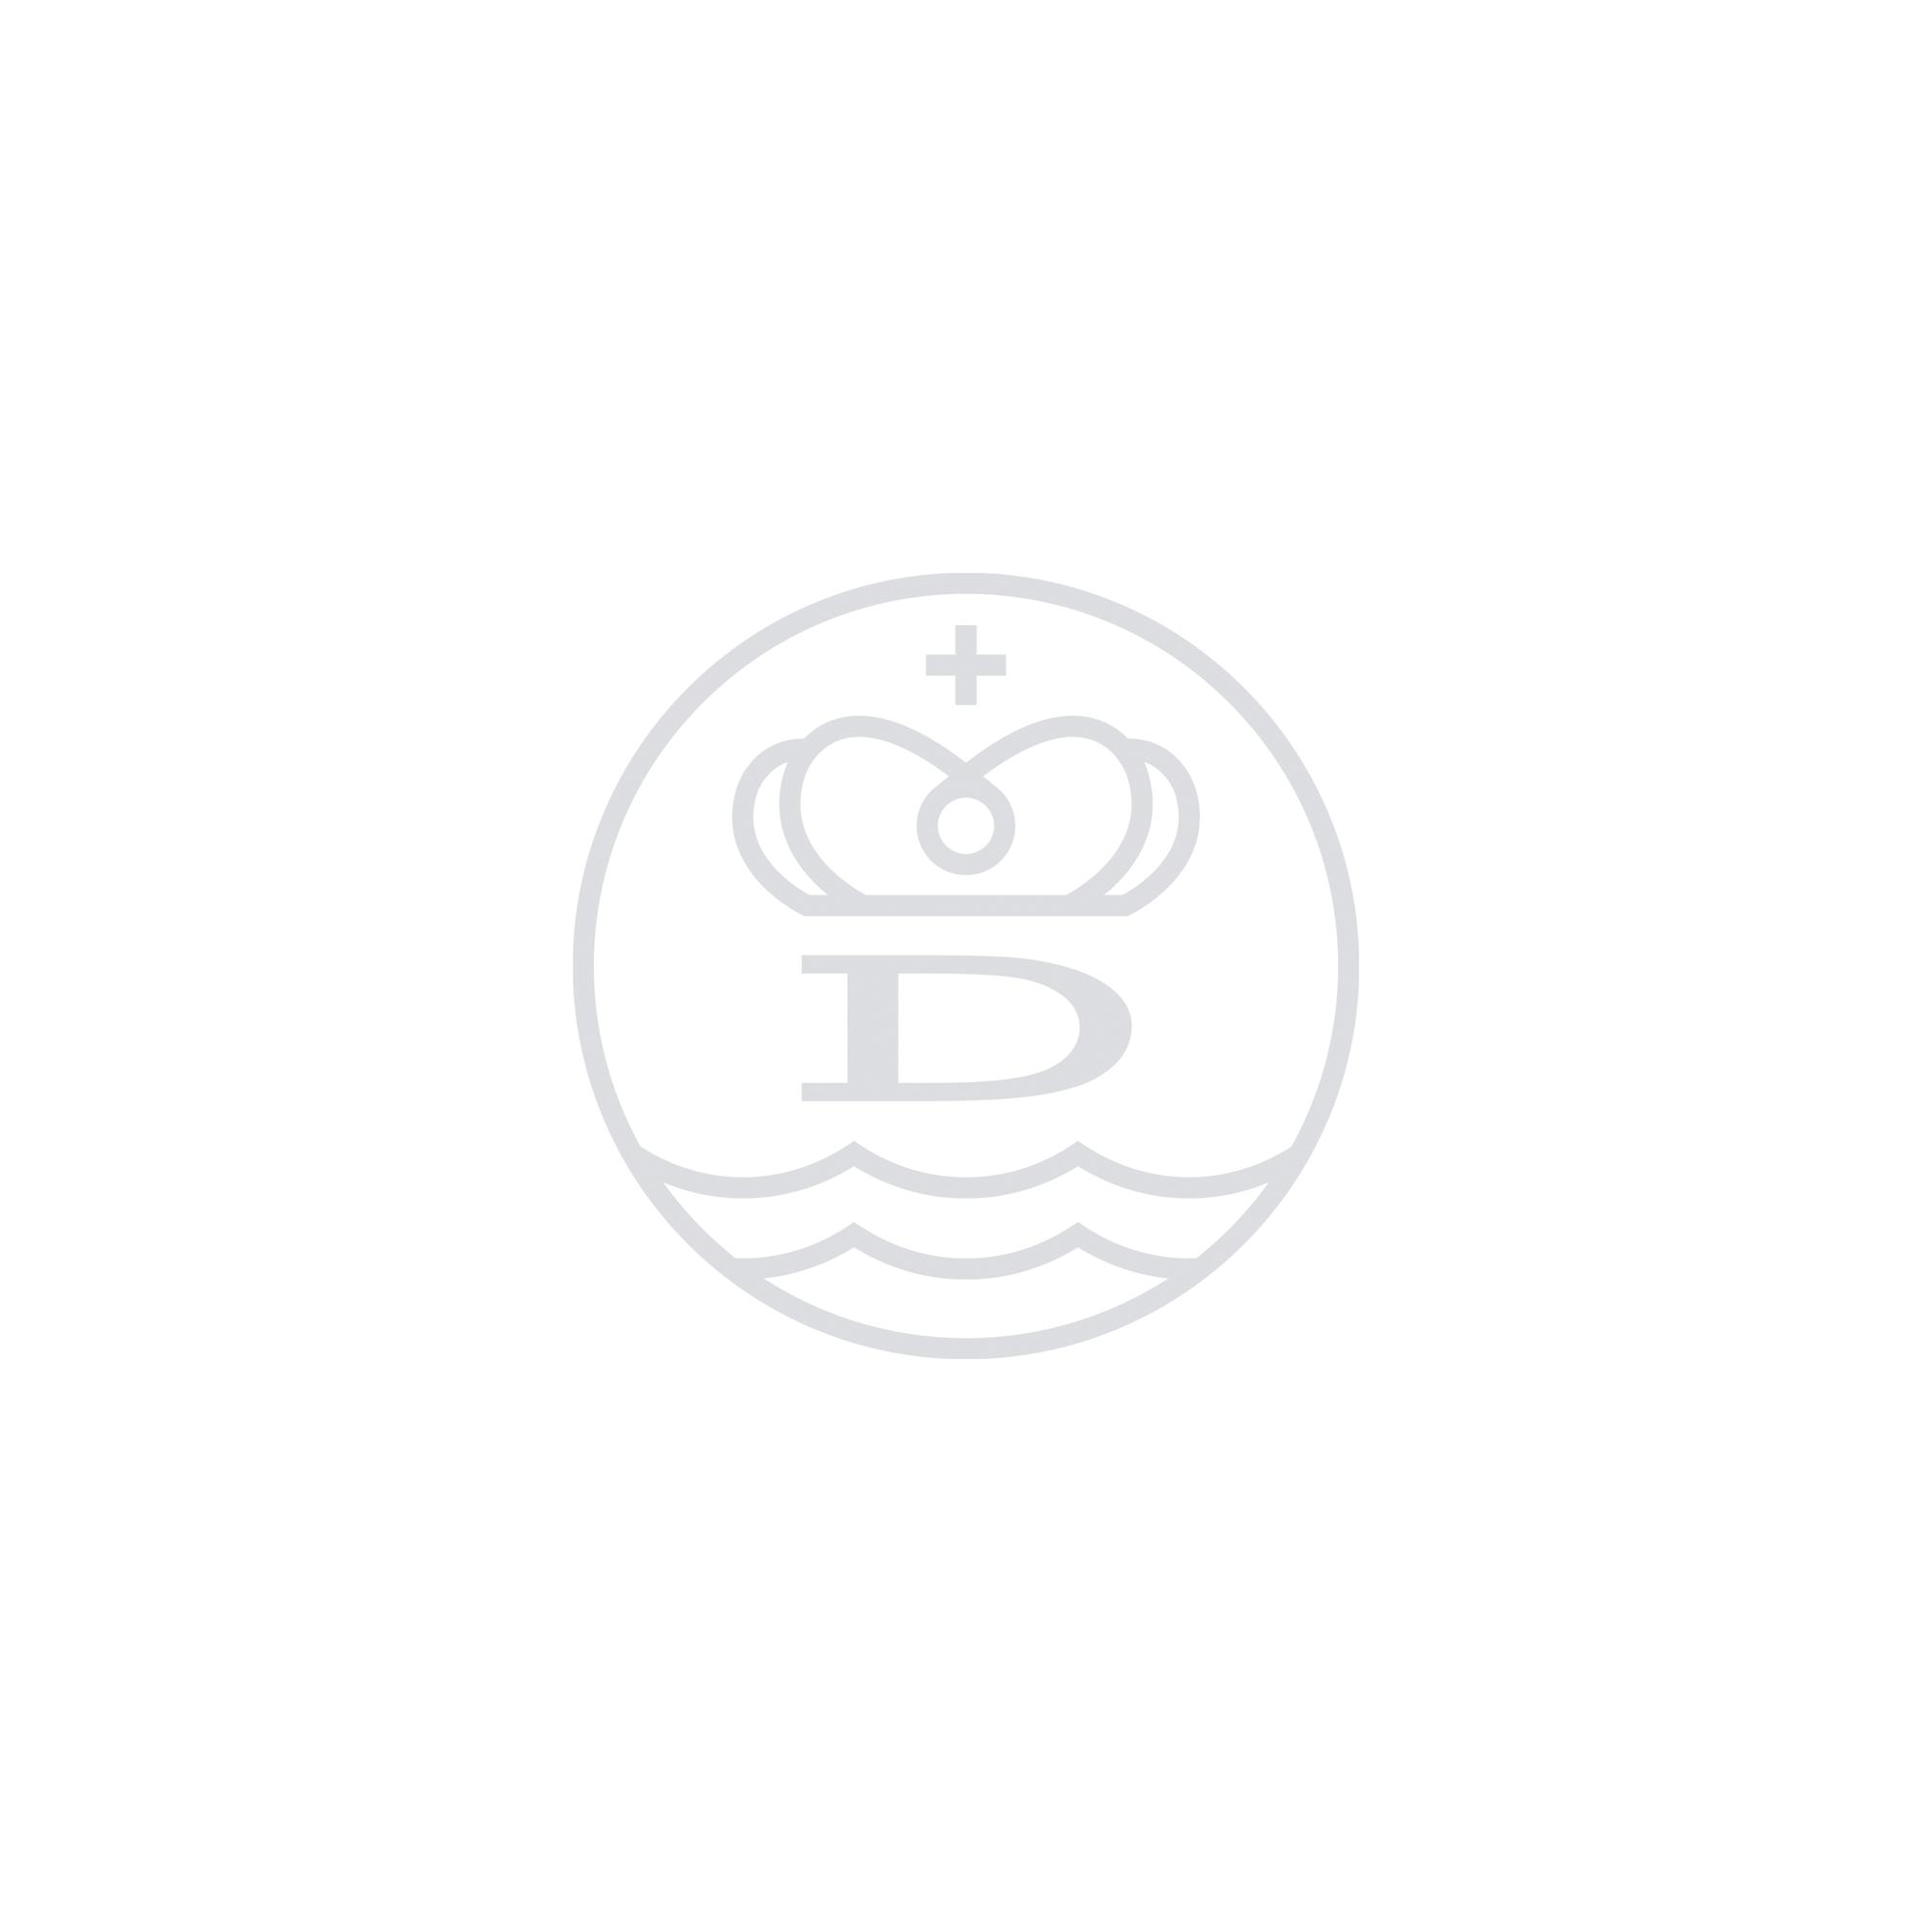 Silver Midi Star Sailing Rope detailed